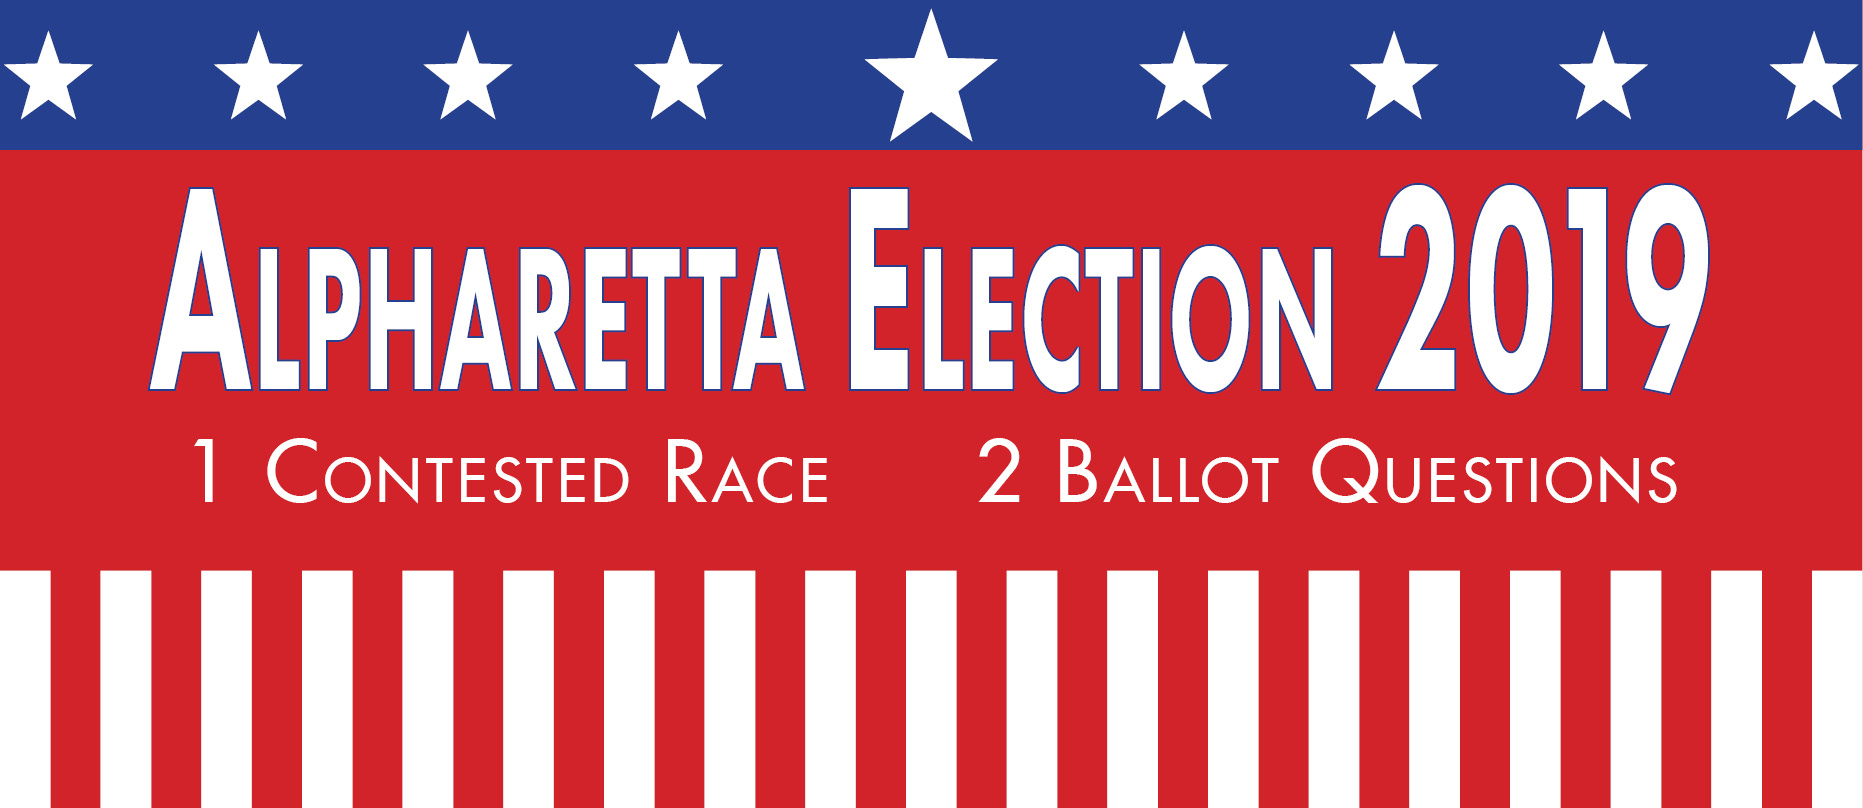 Alpharetta Election 2019 News Item Graphic